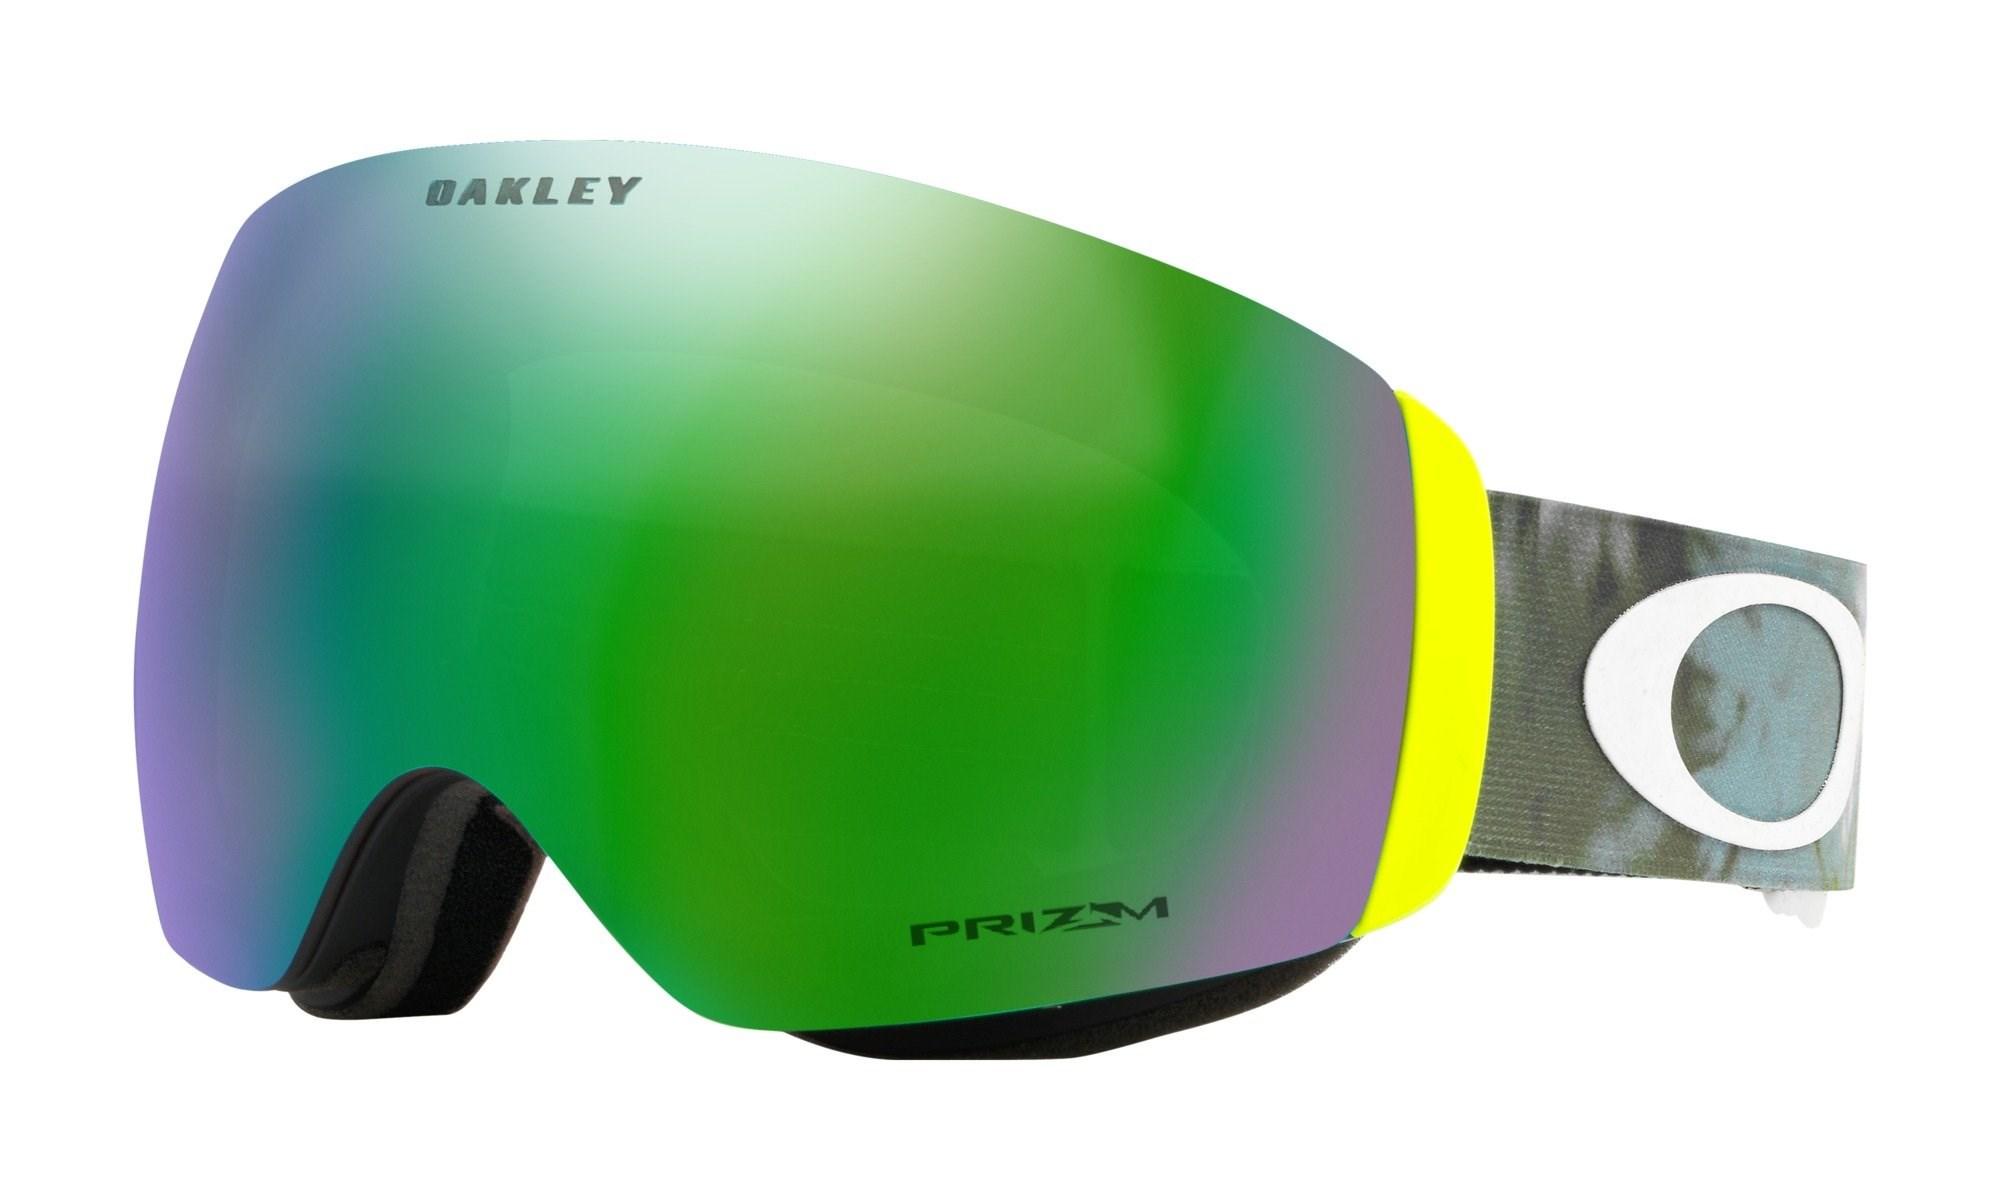 4f44b2fdb6a Oakley Flight Deck XM Ski Goggles 2019 Flurry Prizm Jade. 0 (Be the first  to add a review!)